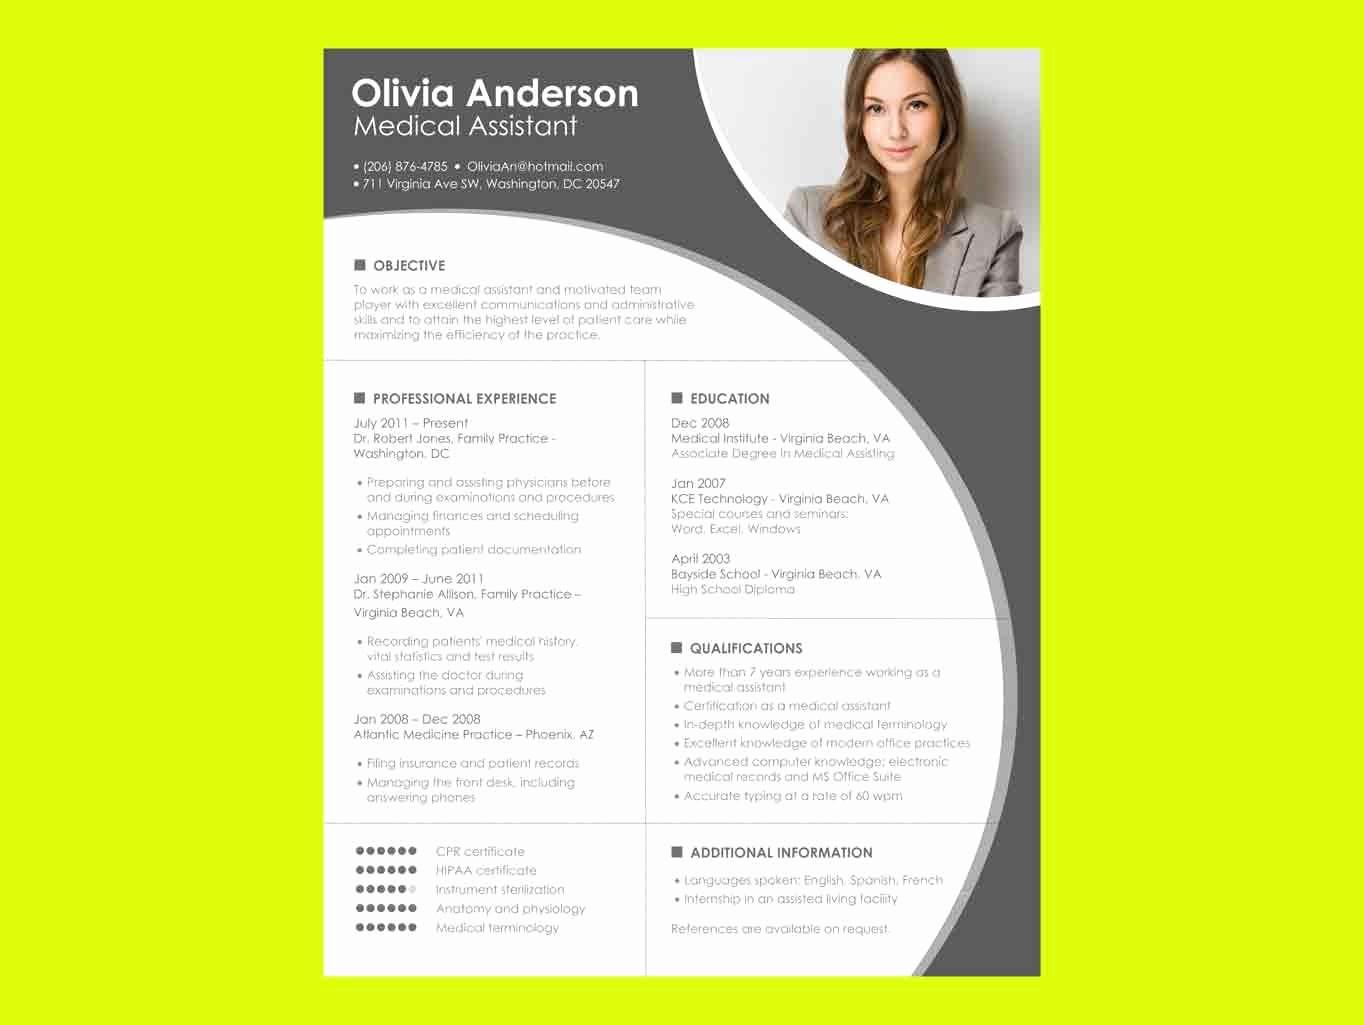 Microsoft Office Word Resume Templates Luxury Resume Templates Microsoft Word Free Download – Perfect